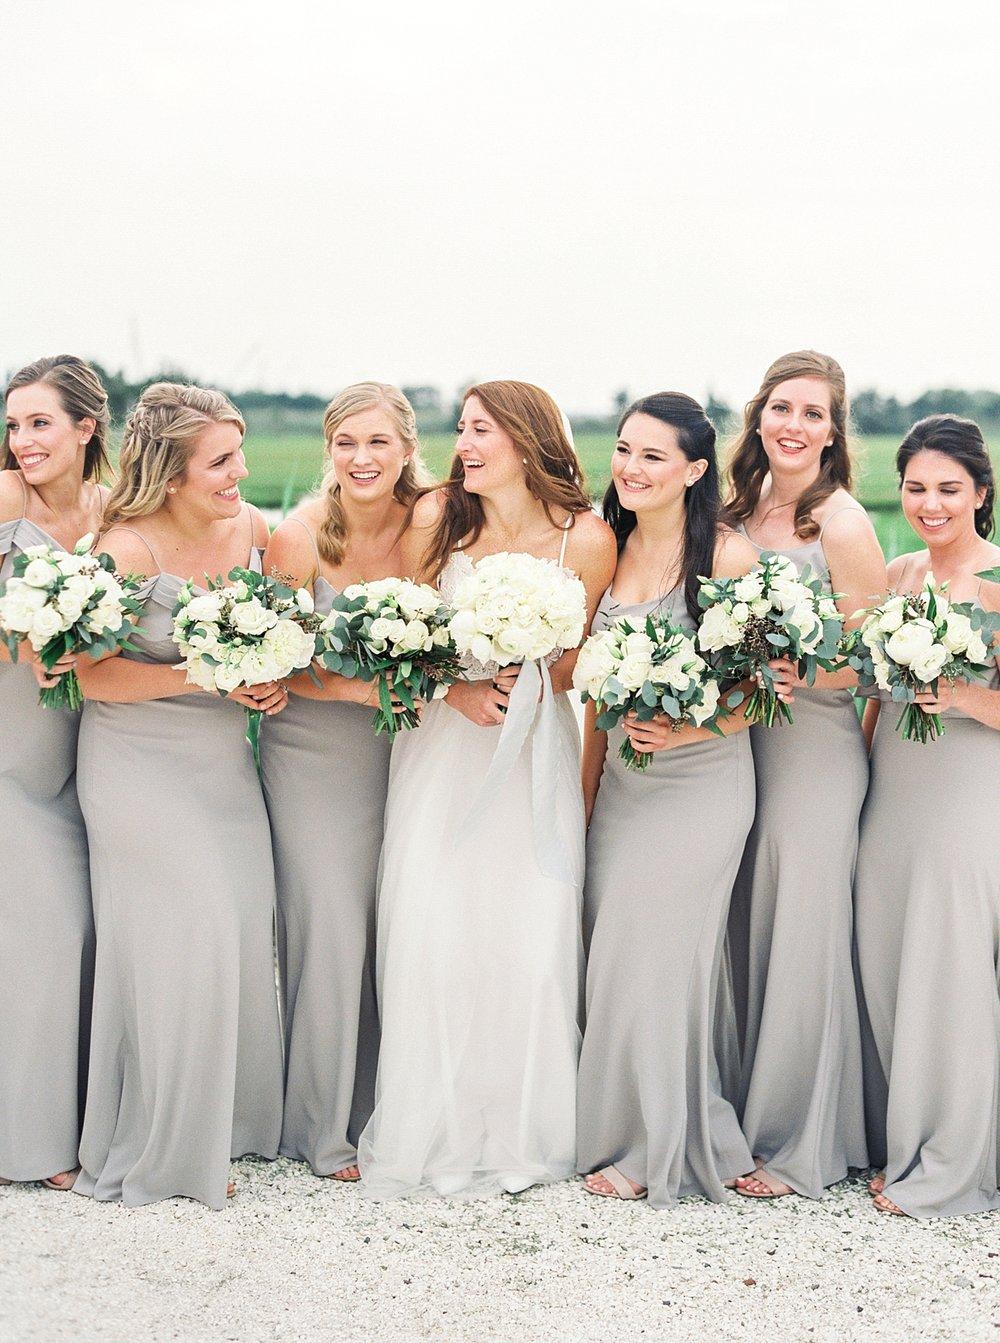 bonnet_island_estate_lbi_nj_wedding_photos_0026.jpg